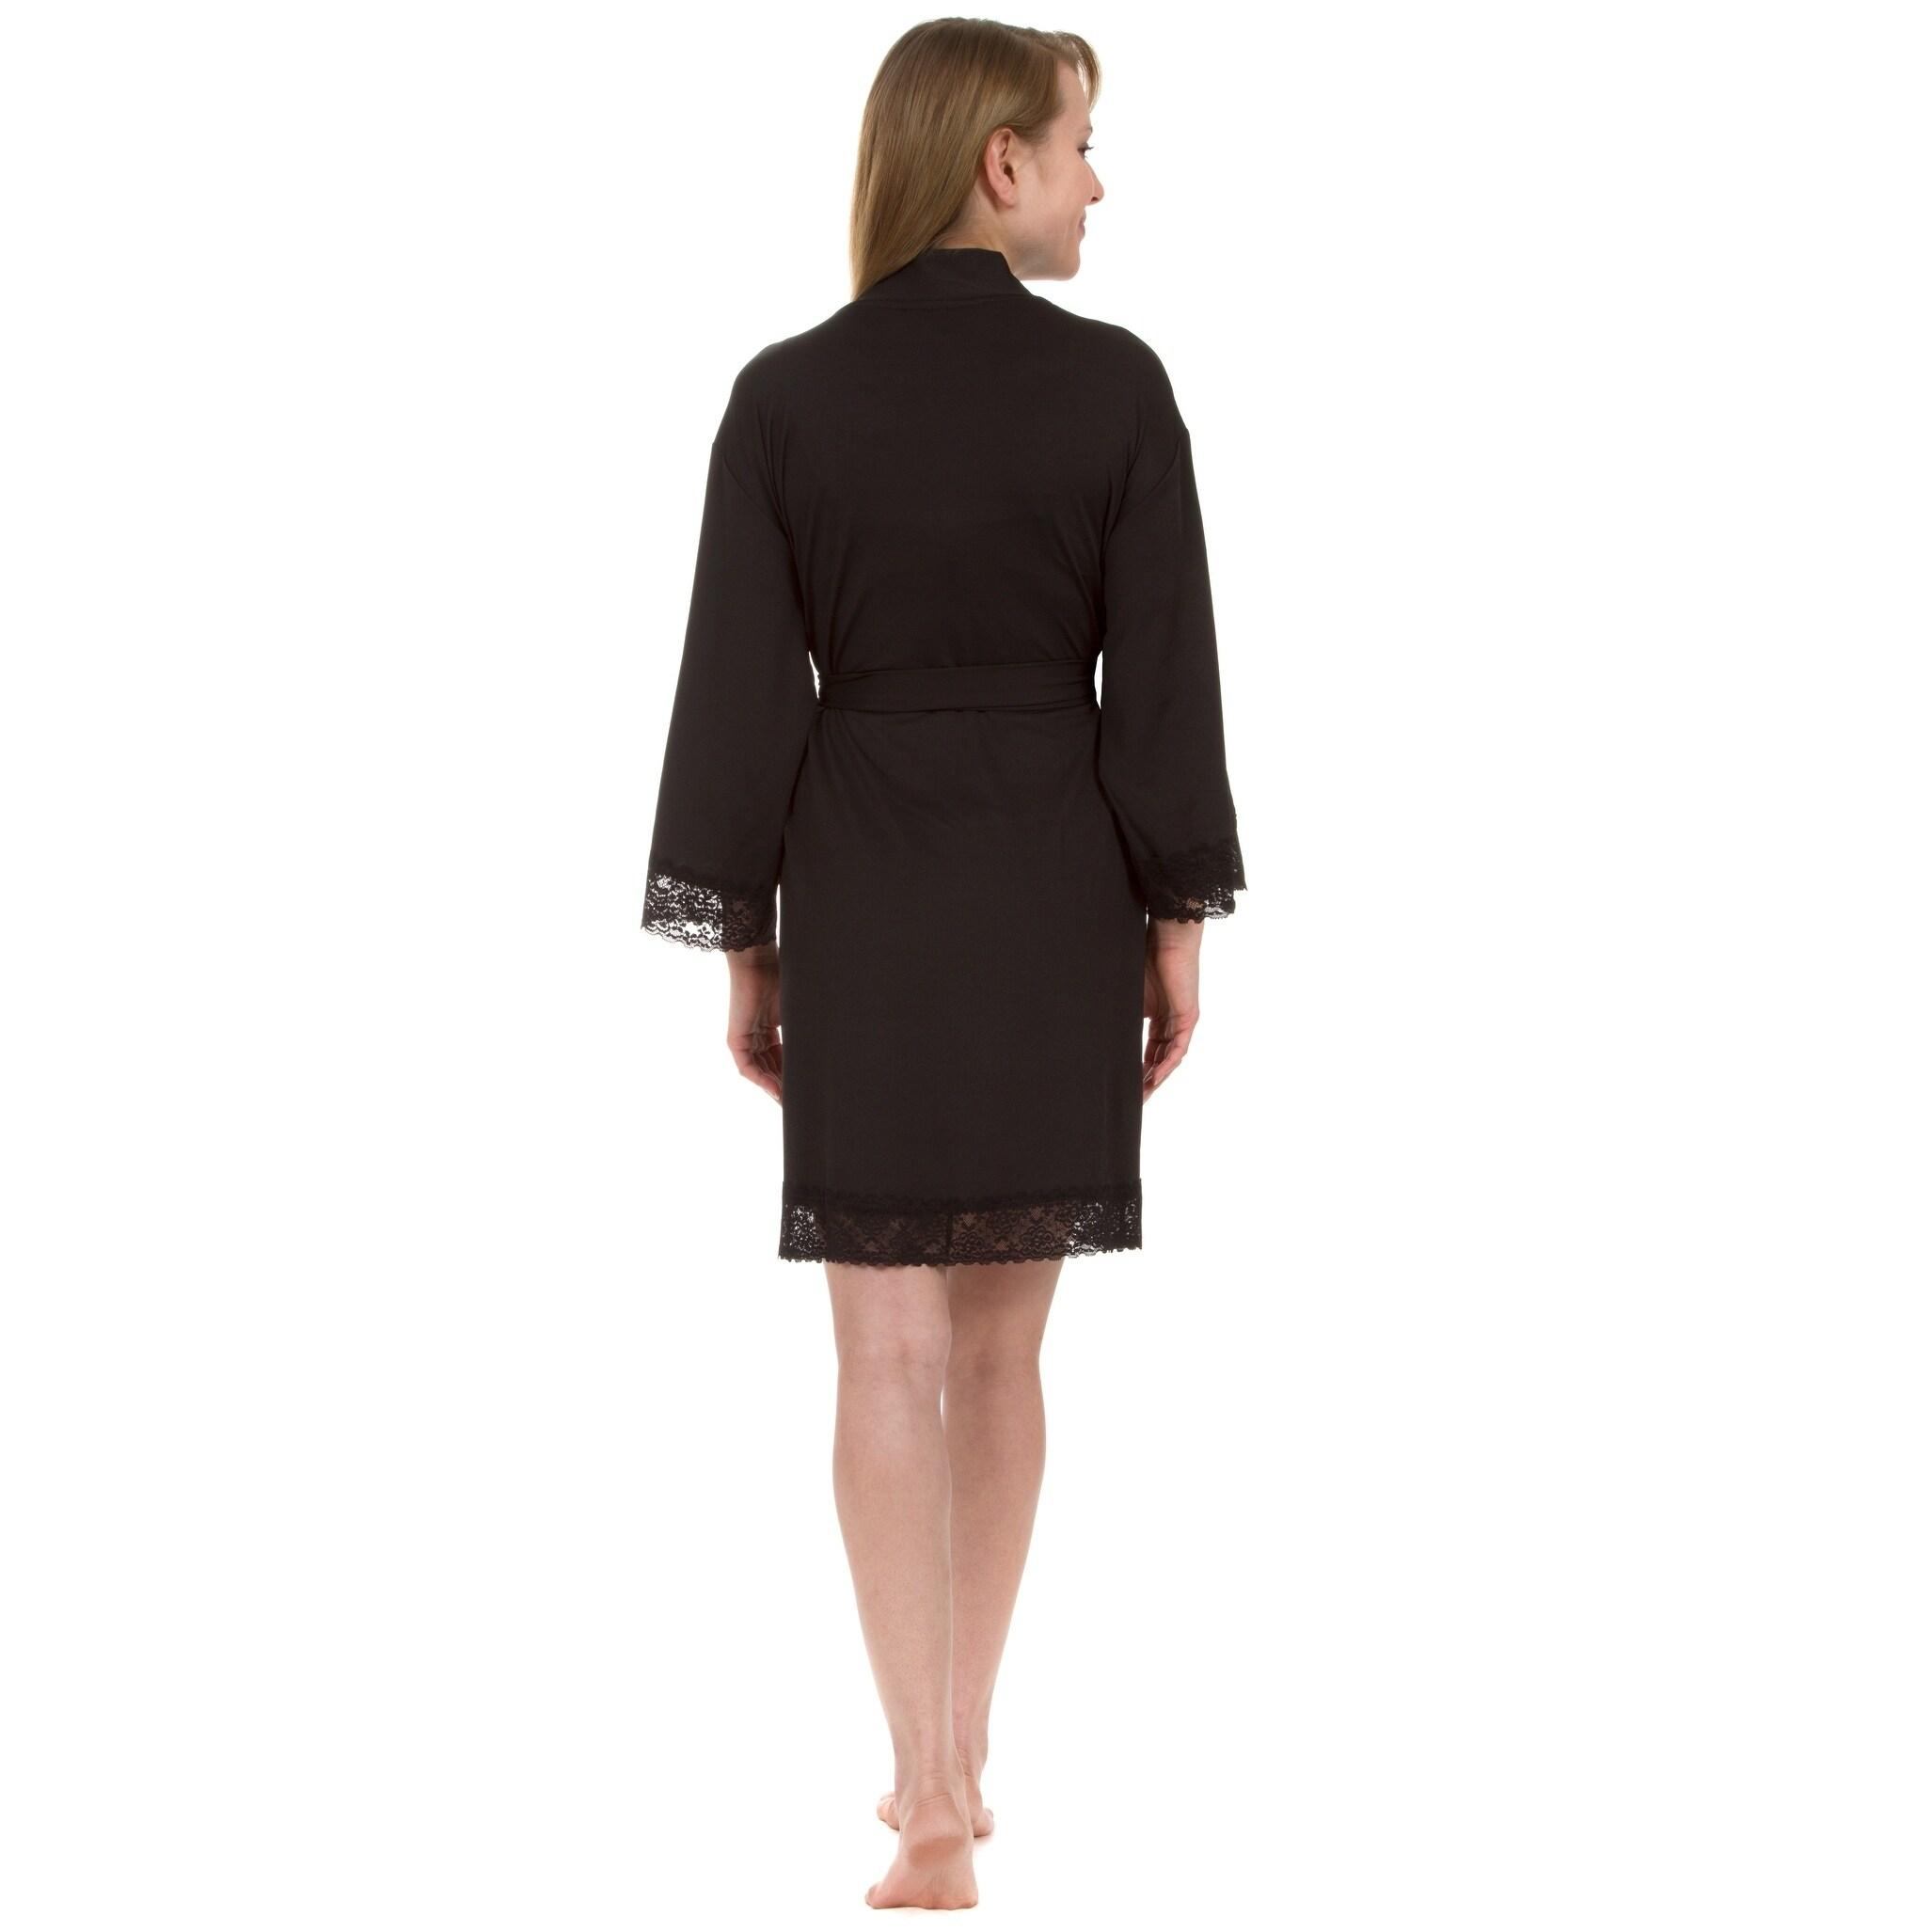 9cba72afa6c Shop Leisureland Lace Jersey Knee-Length Robe - Free Shipping On ...